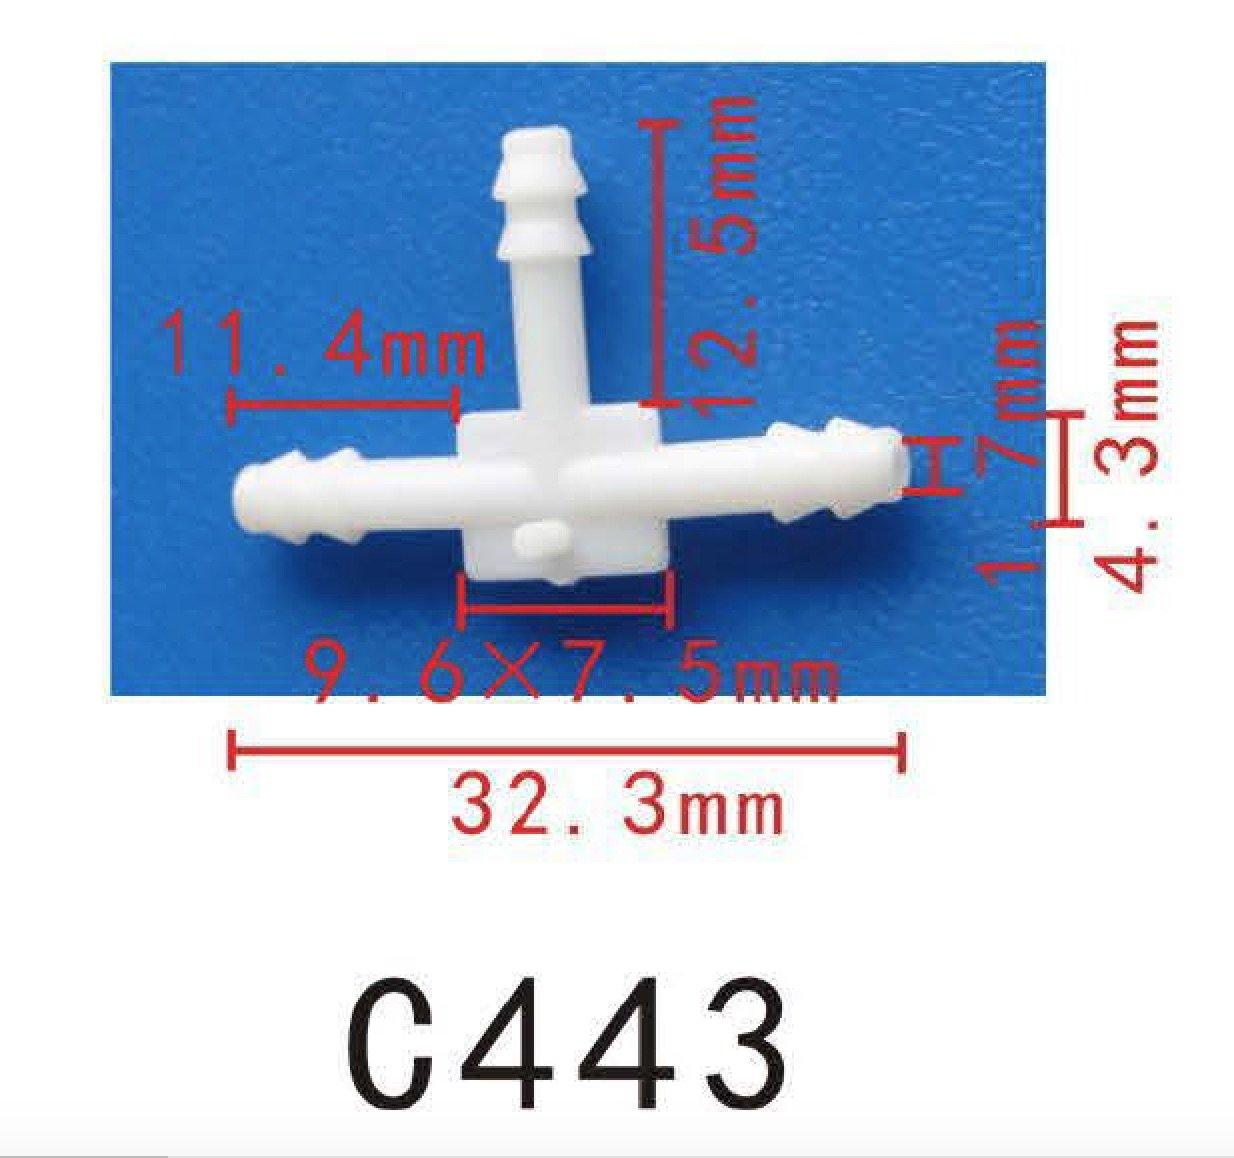 5 Feet per reel Autobahn88 High Performance Silicone Vacuum Hose OD 0.71 Black 12mm ID 0.47 1.5 Meter 18mm